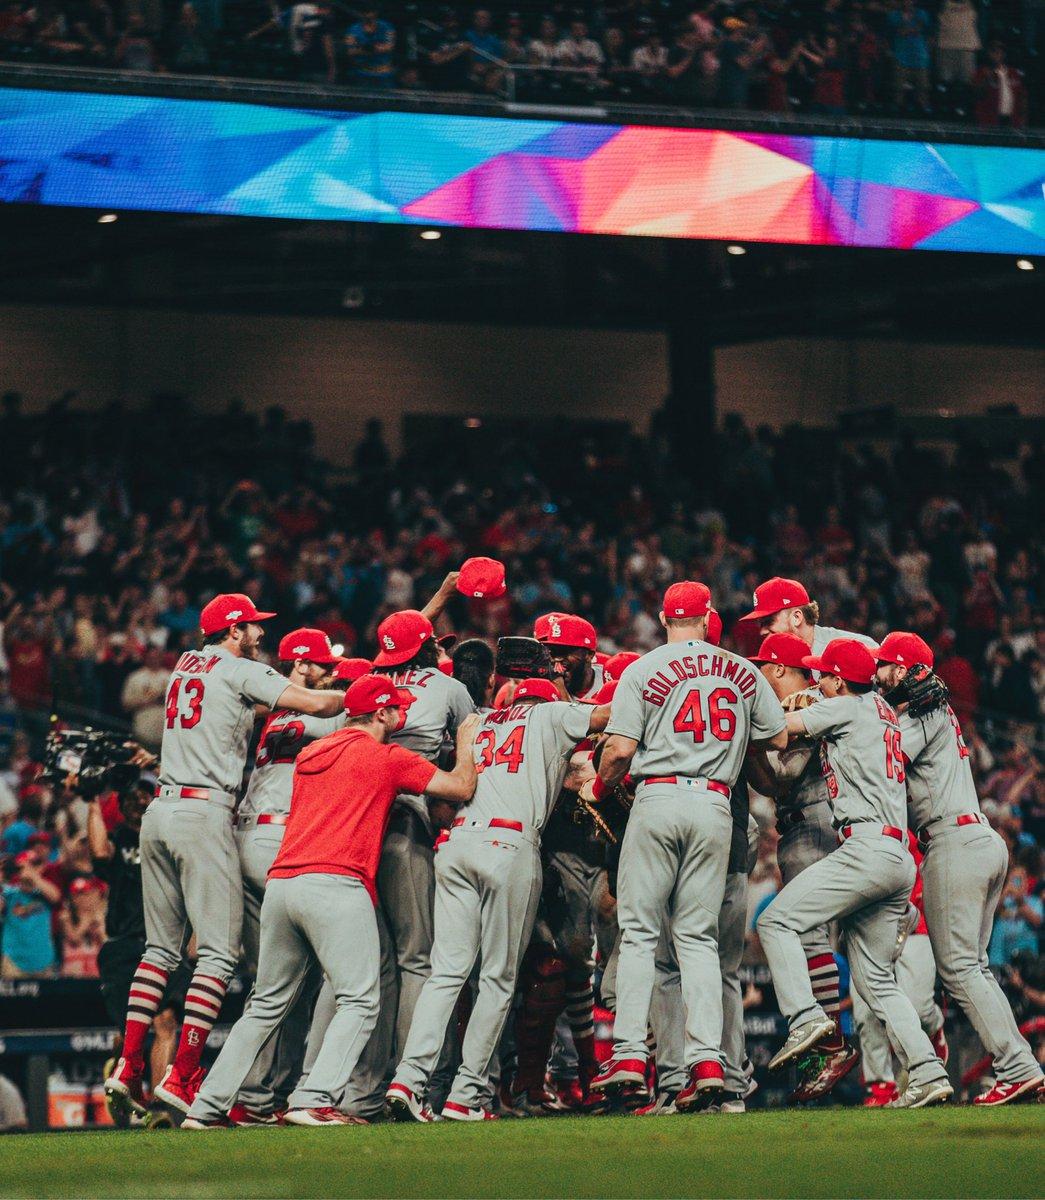 cardinals game tomorrow giveaway